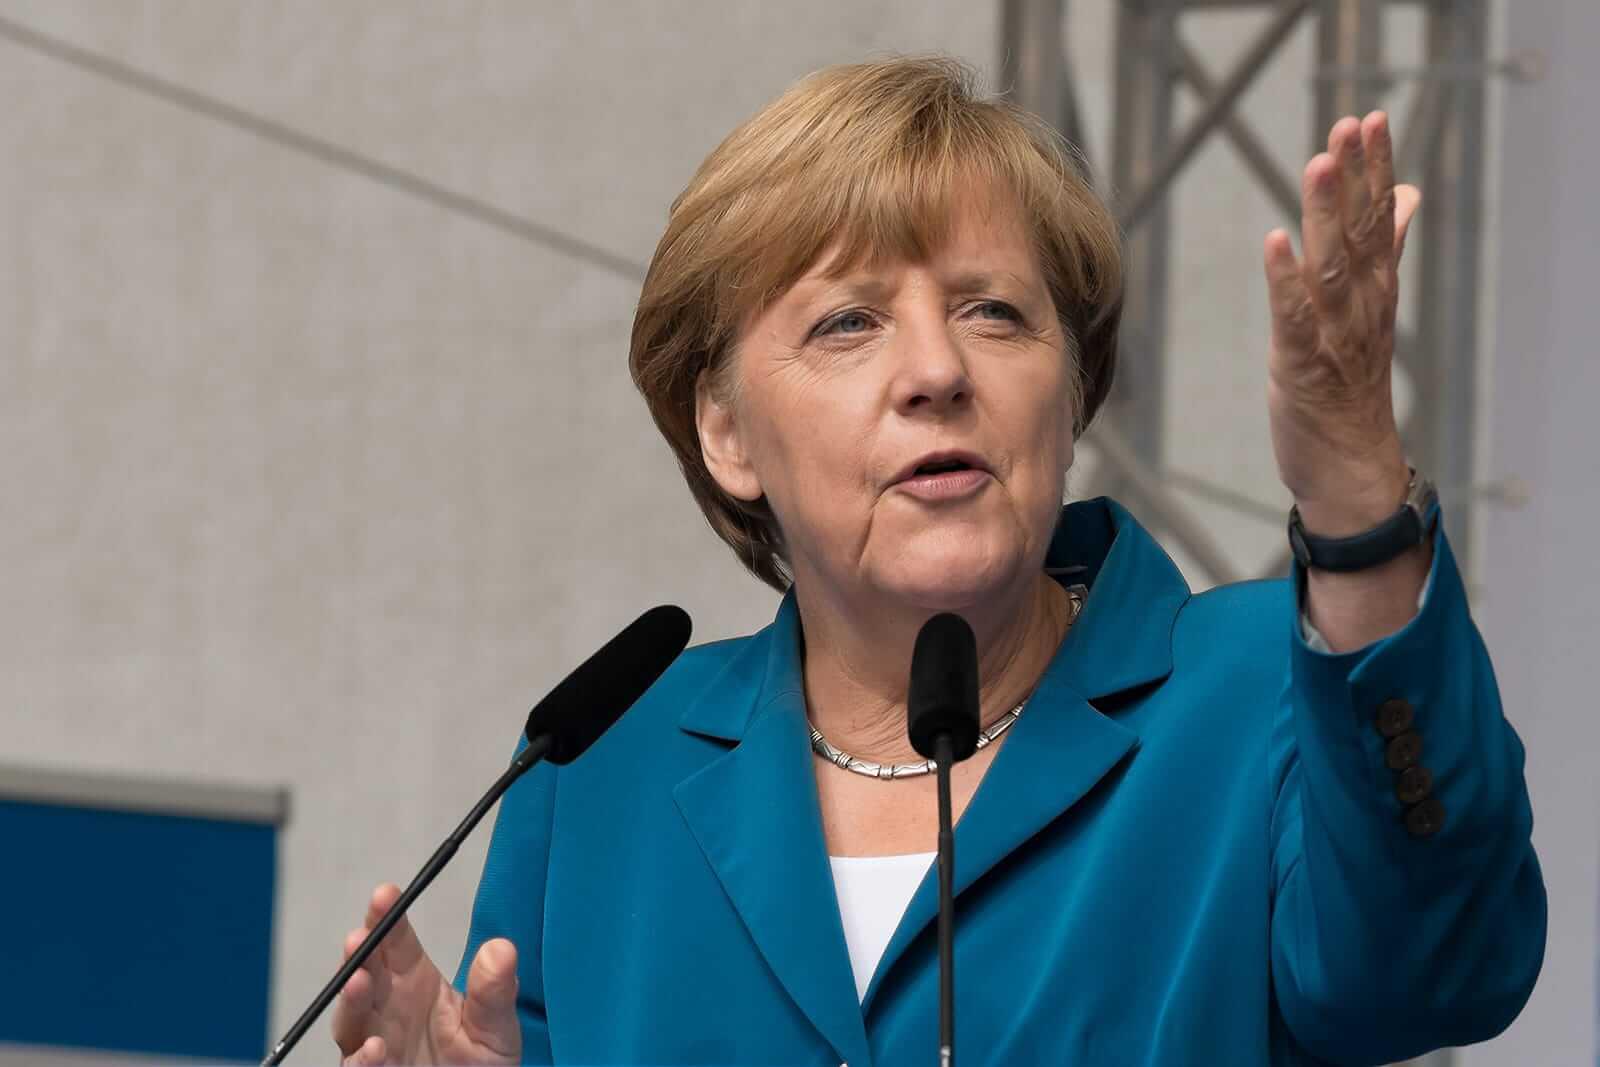 Hacker, Angela Merkel